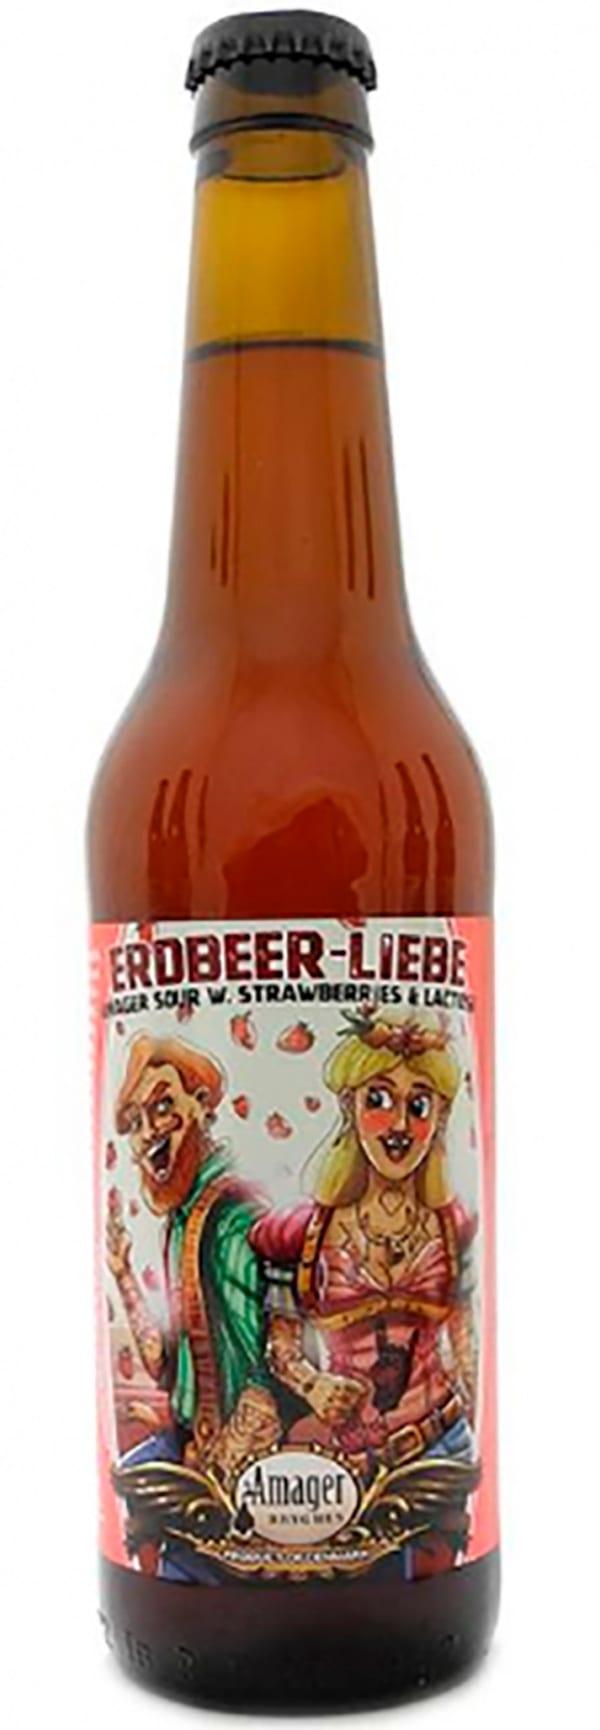 Amager Erdbeer Liebe